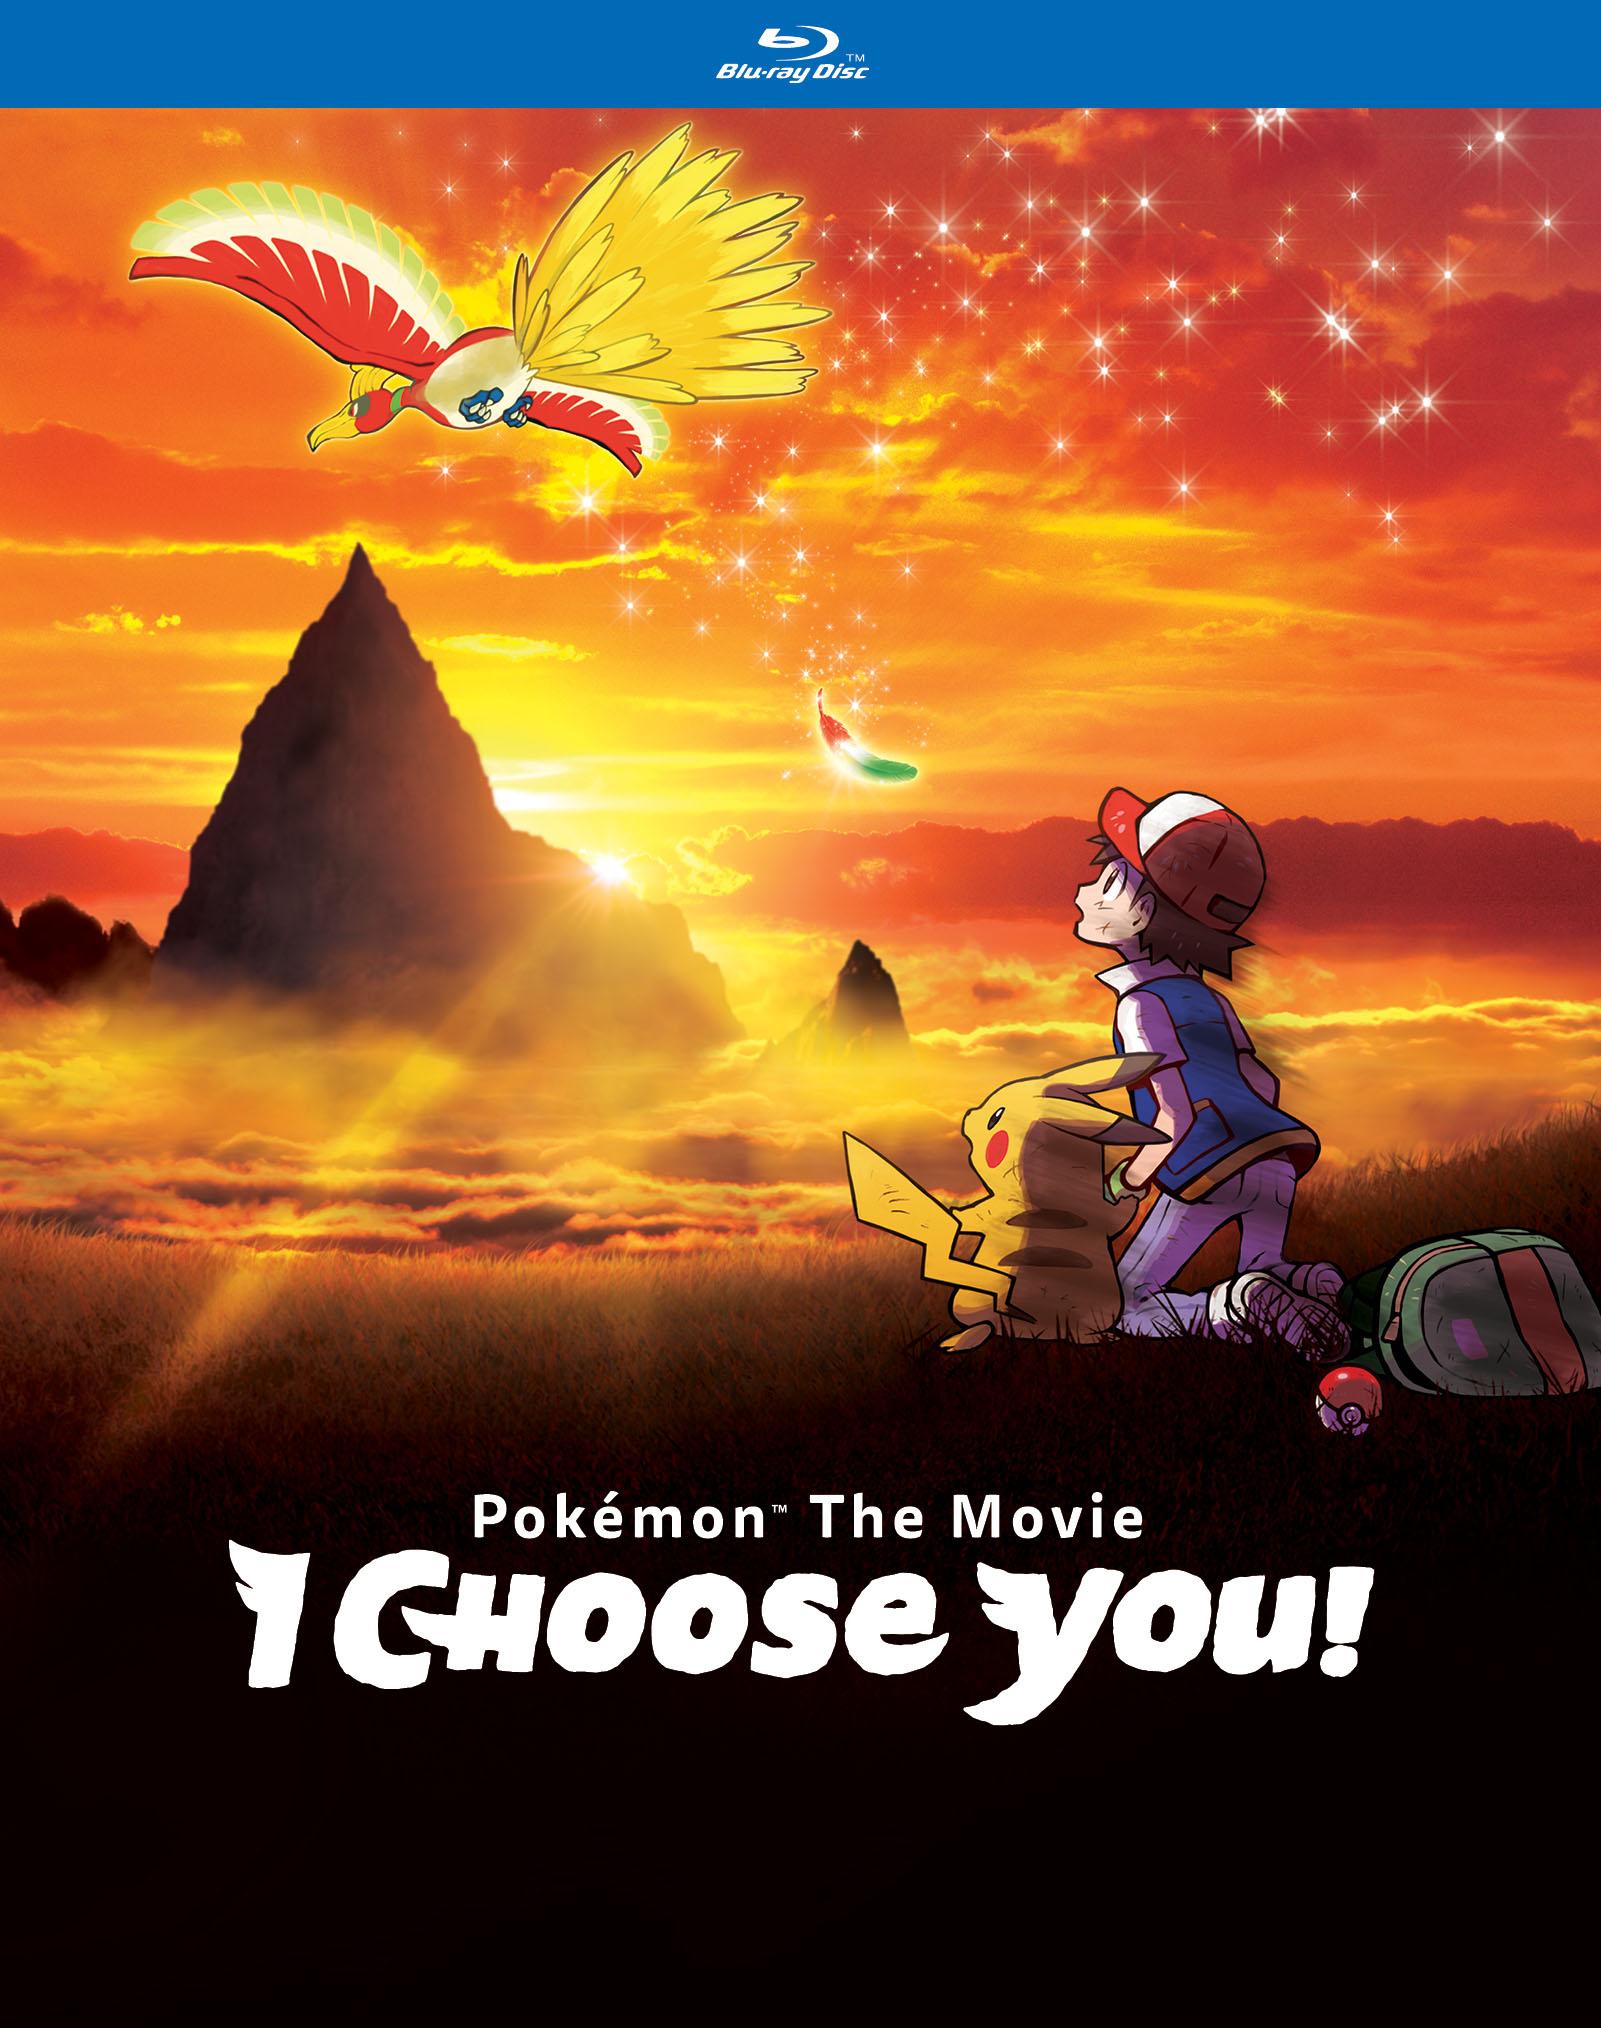 2) Rare Pokemon Pikachu Case with 4 Viz